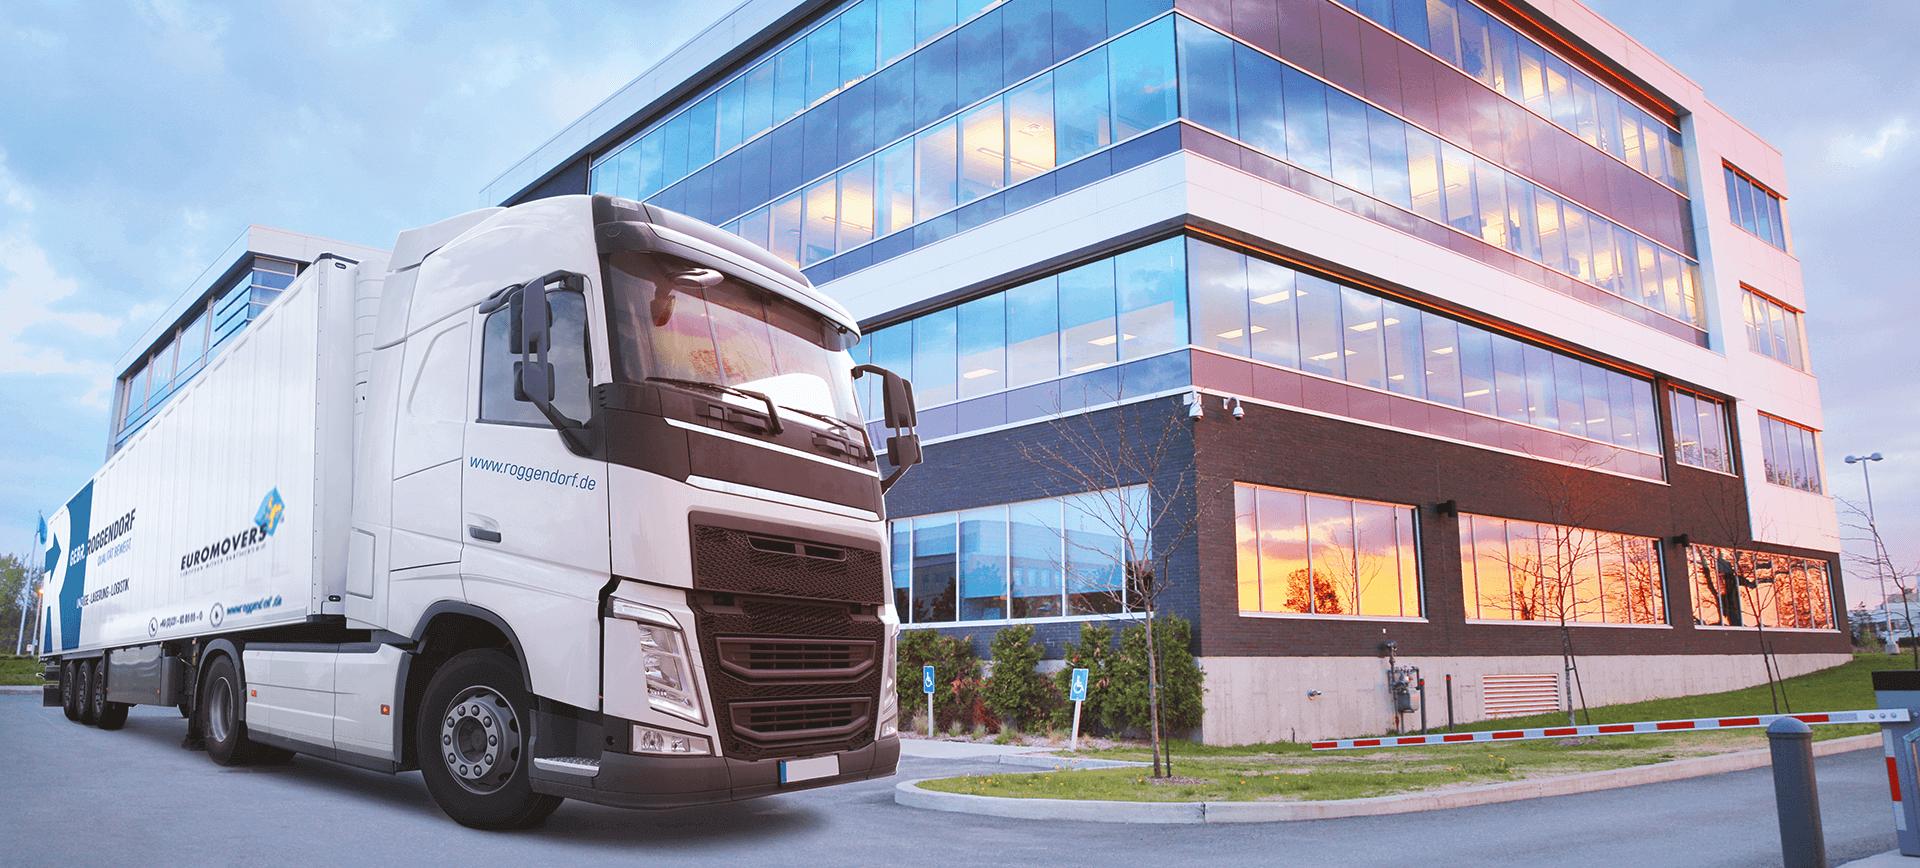 roggendorf umzug service firmenumzug betriebsverlagerung transportfahrzeug